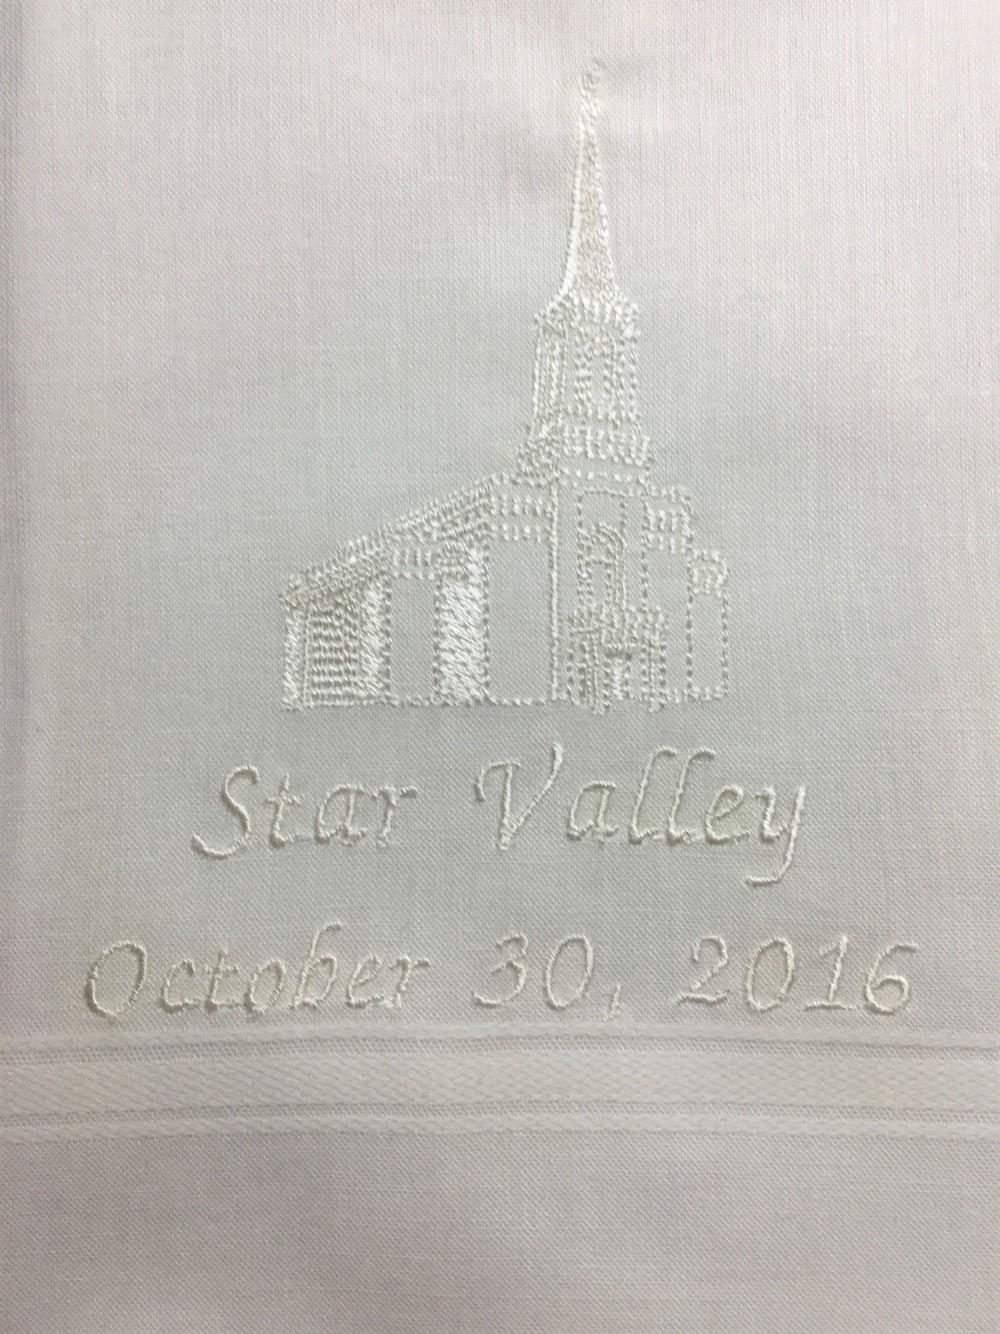 Star Valley Men date